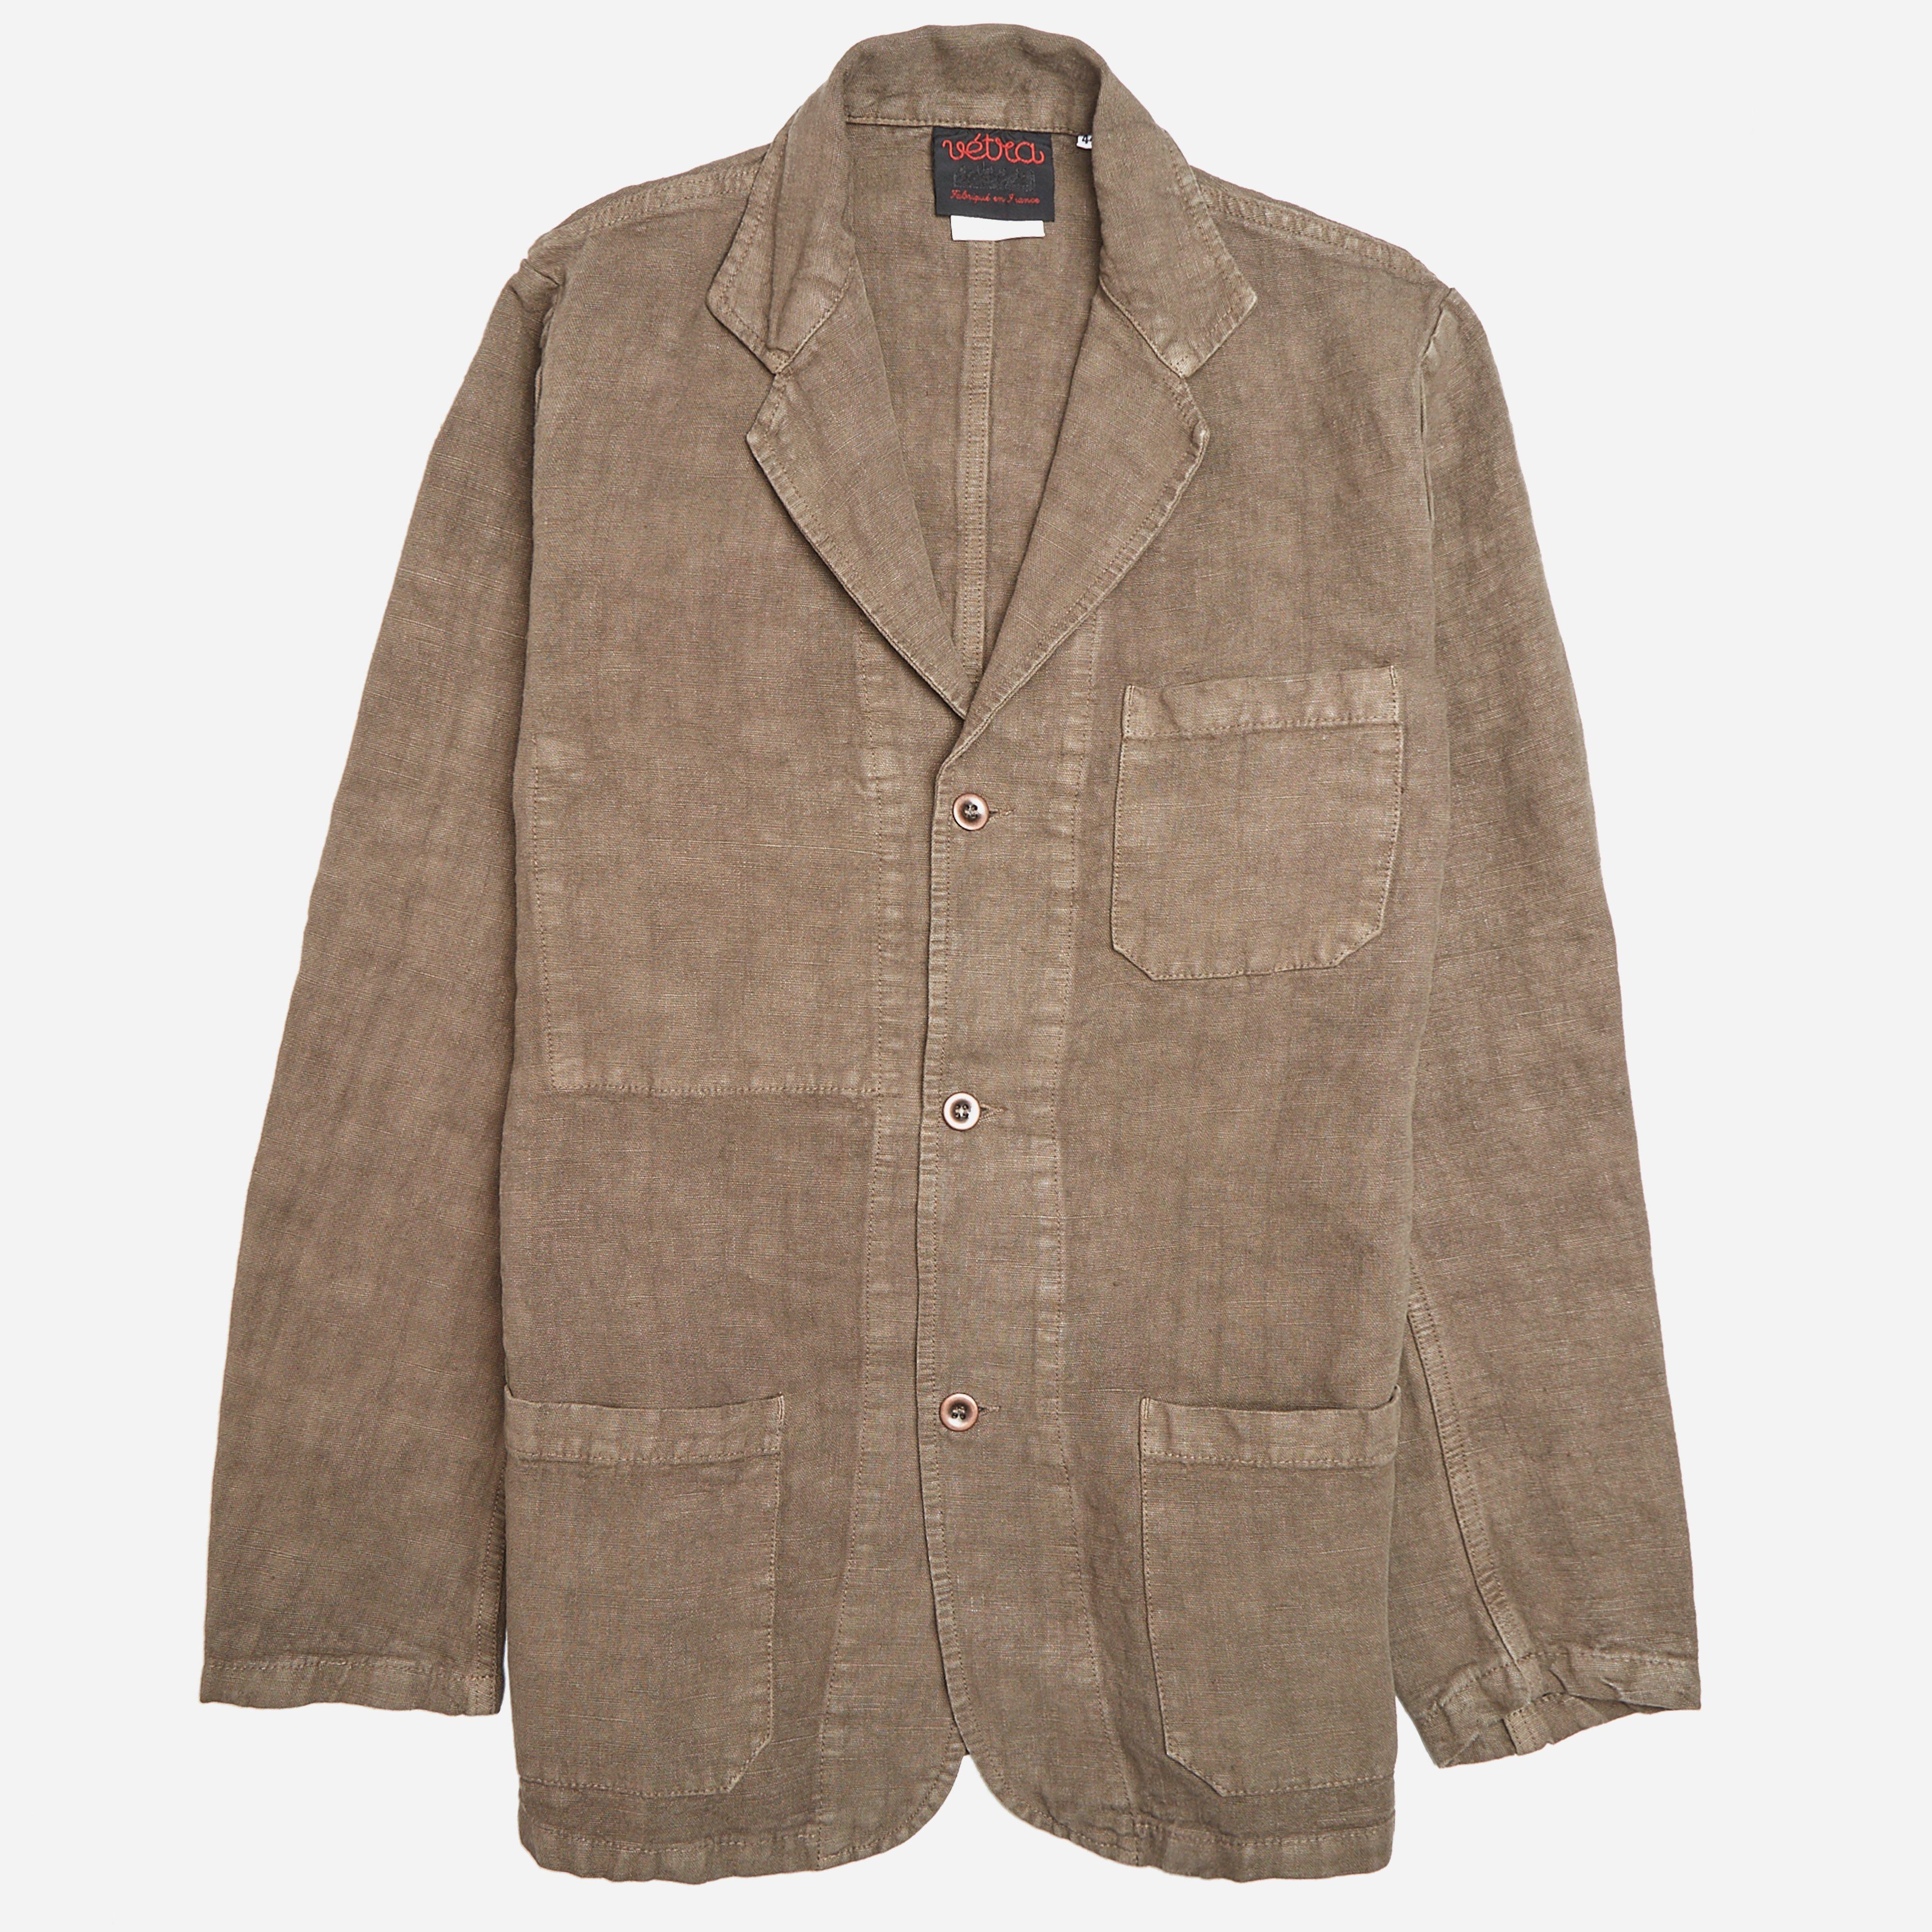 Vetra 24 Heavy Linen Blazer